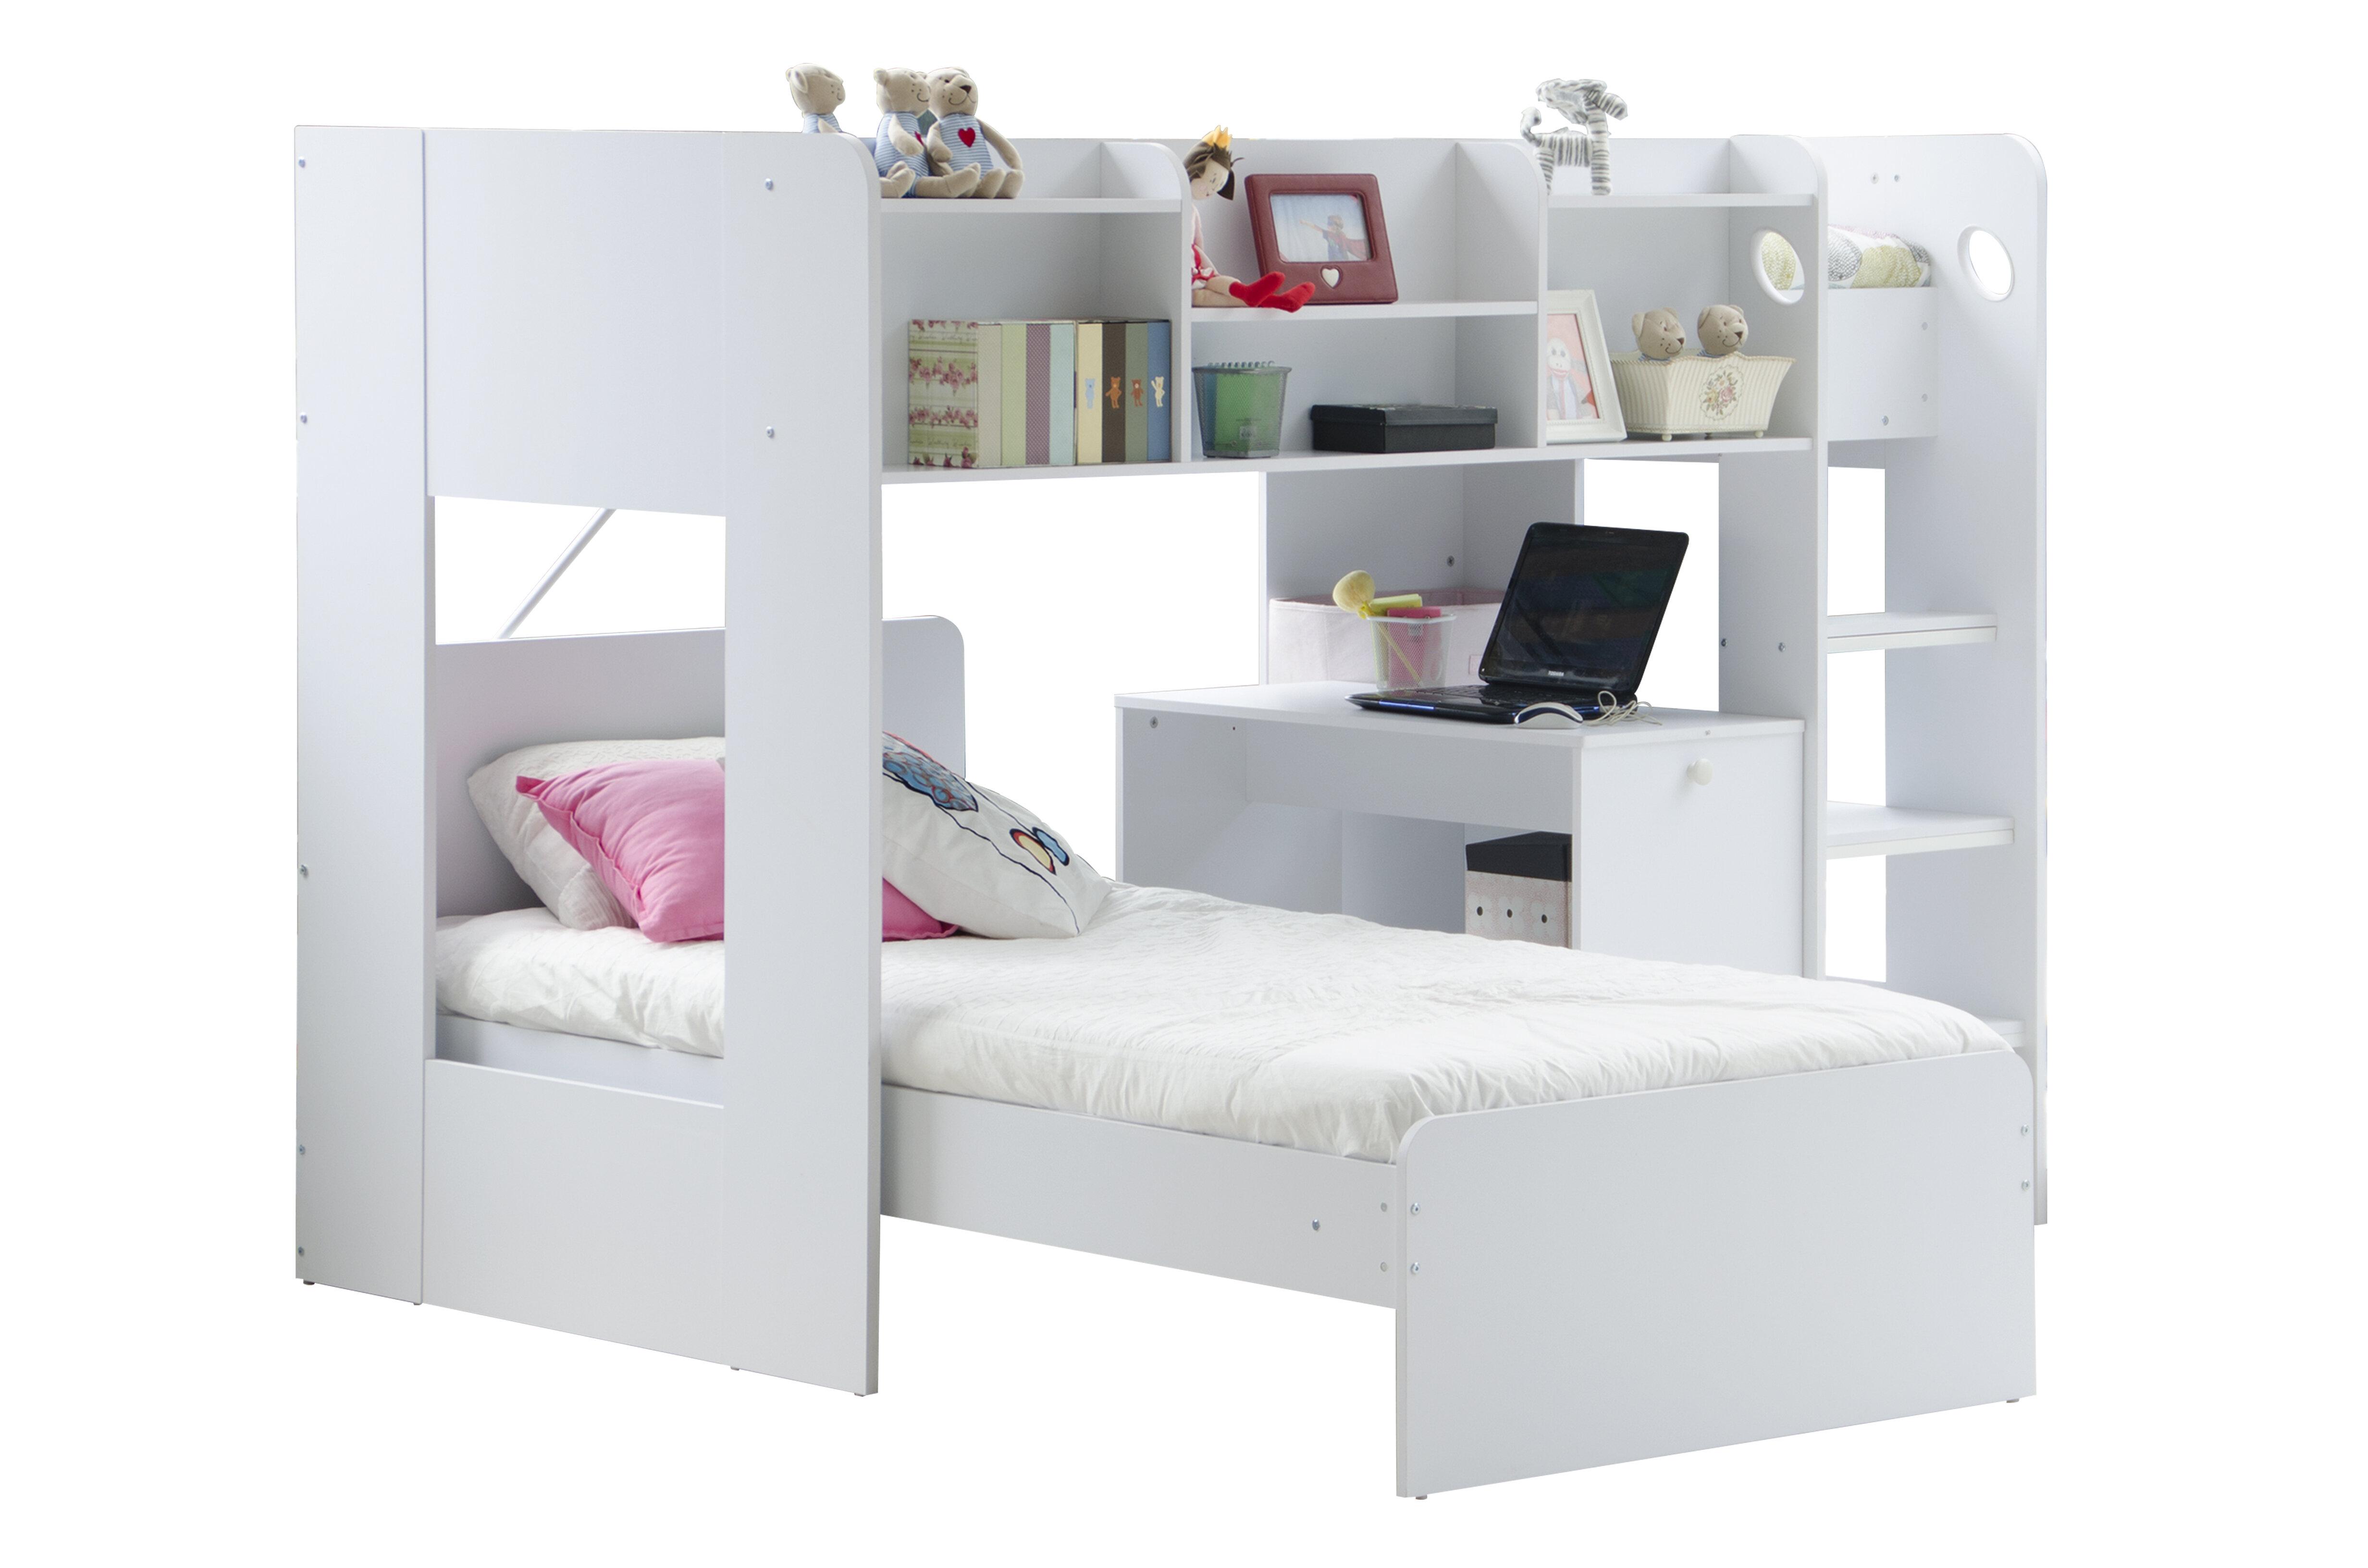 Home Loft Concept Wizard L-Shape Bunk Bed with Shelf | Wayfair.co.uk